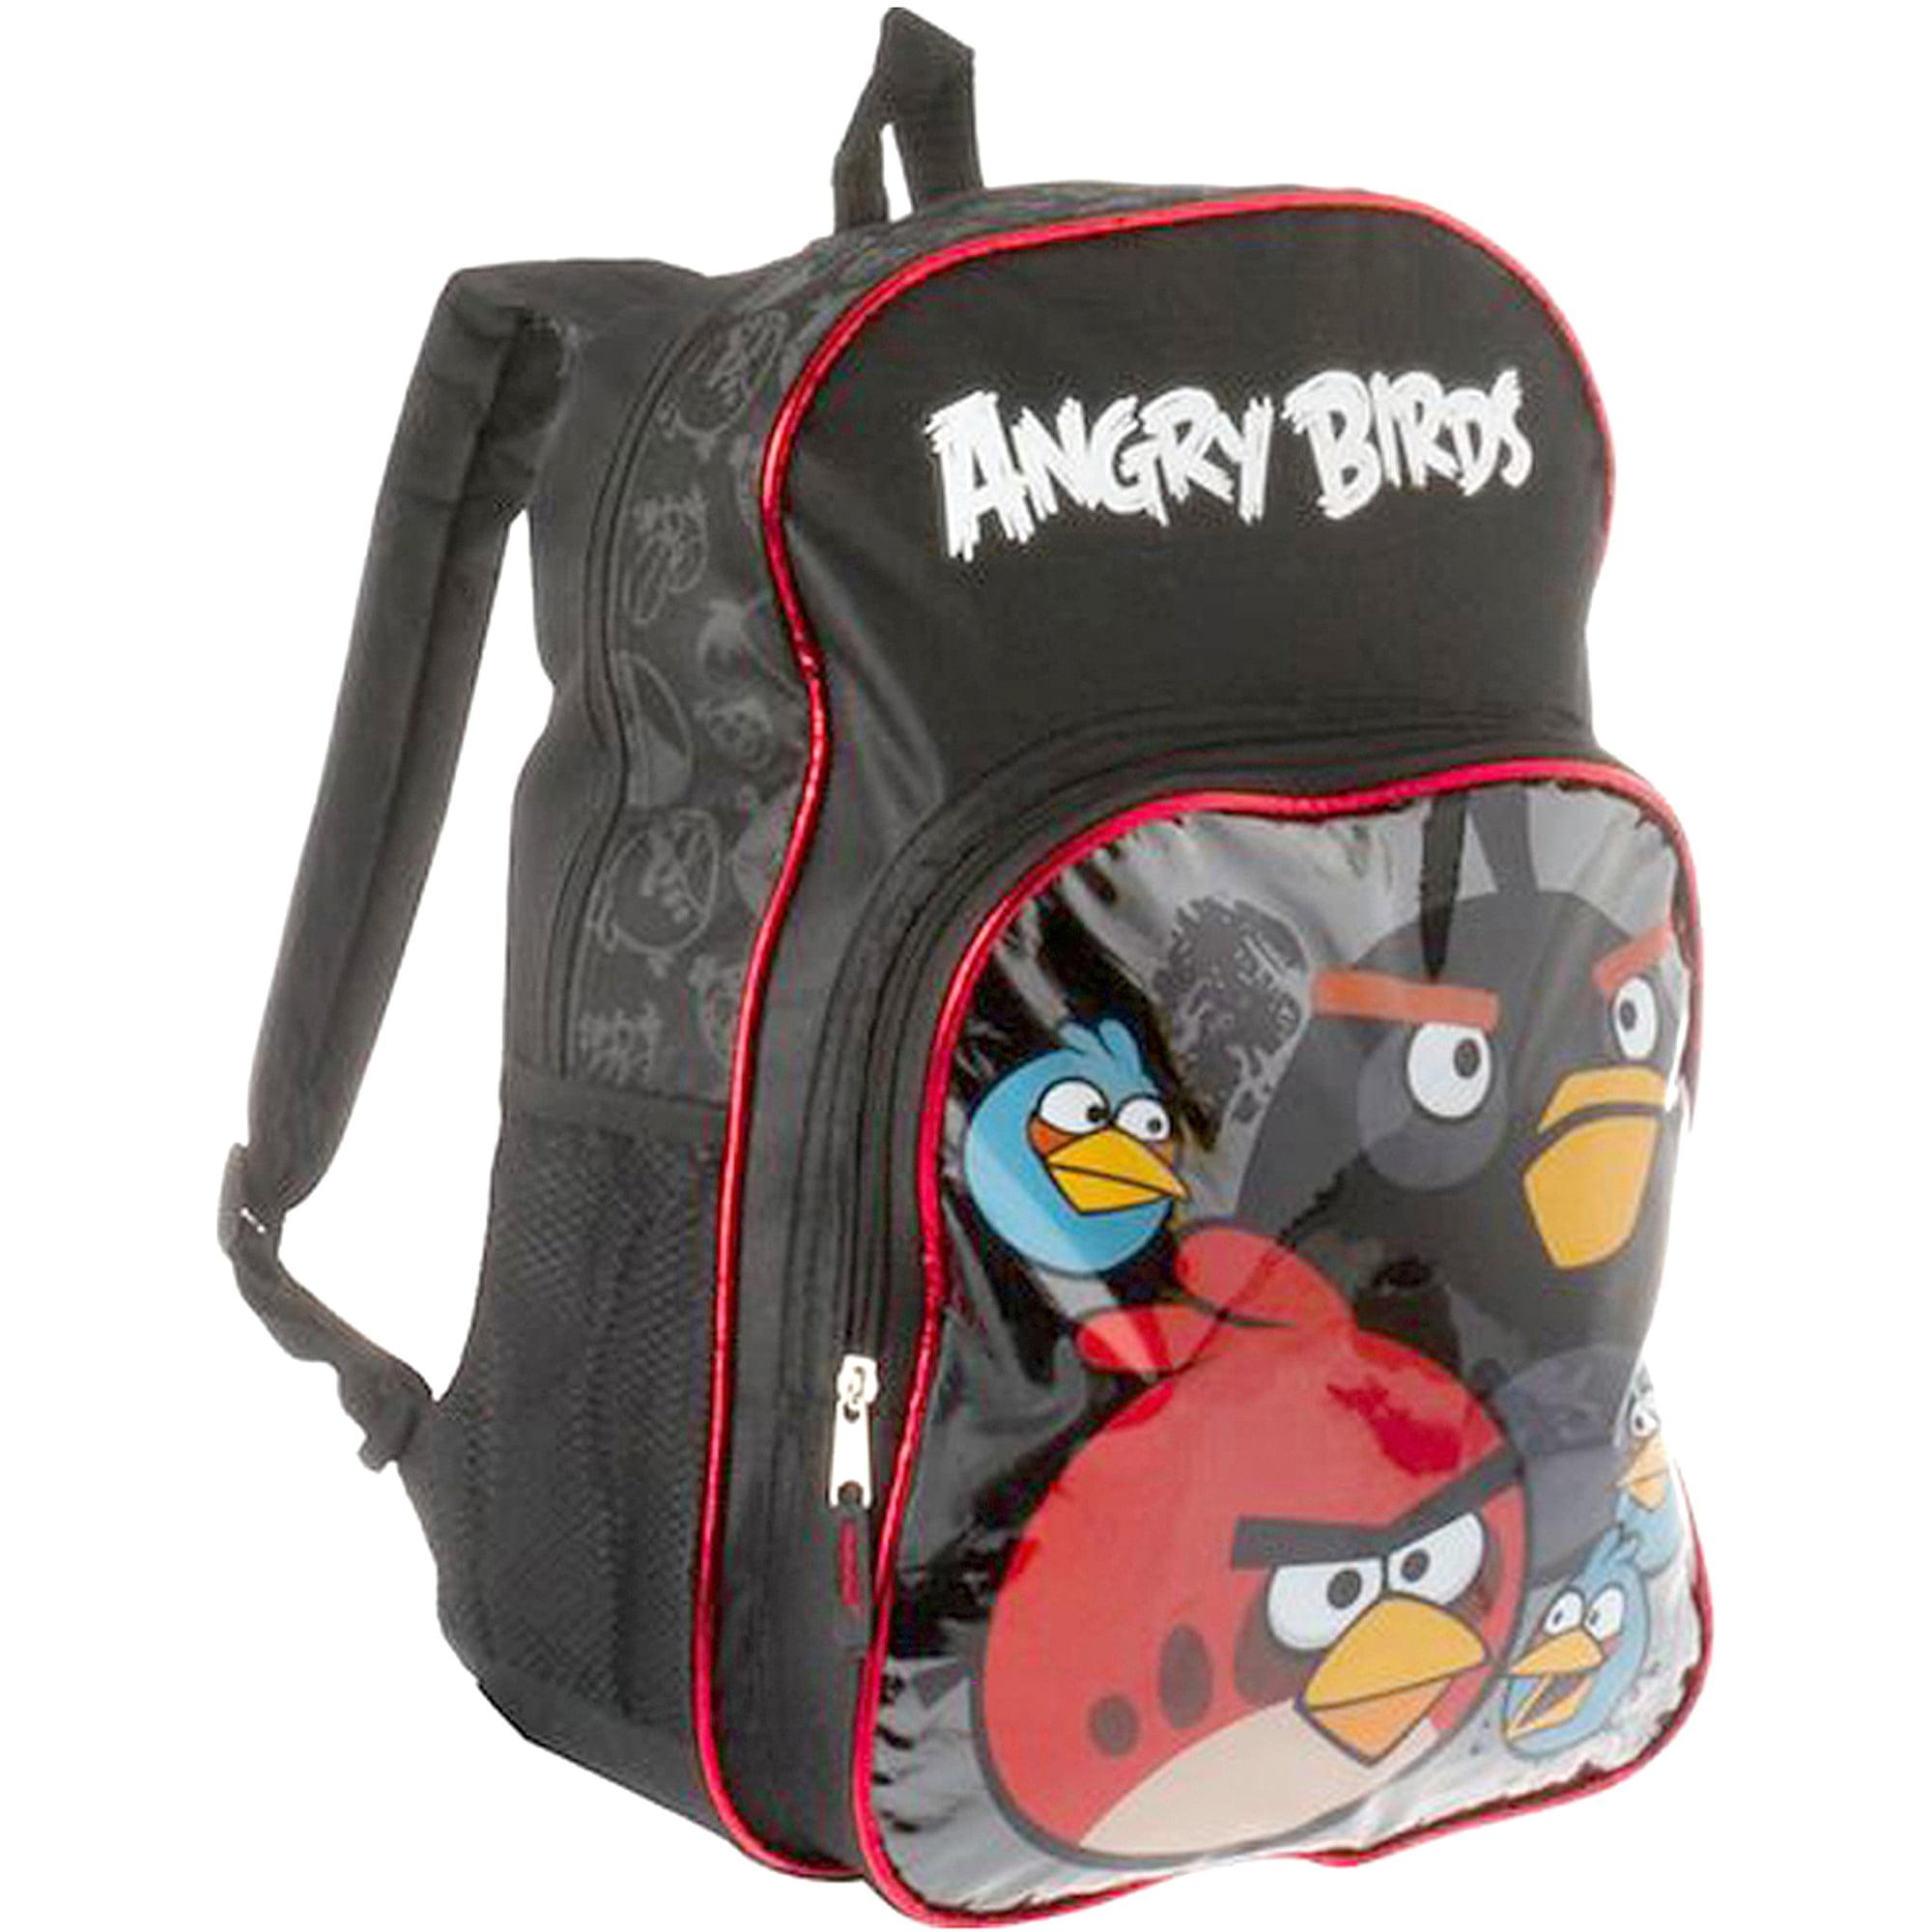 73701fecf34b Angry Birds 16 Inch Backpack - Walmart.com